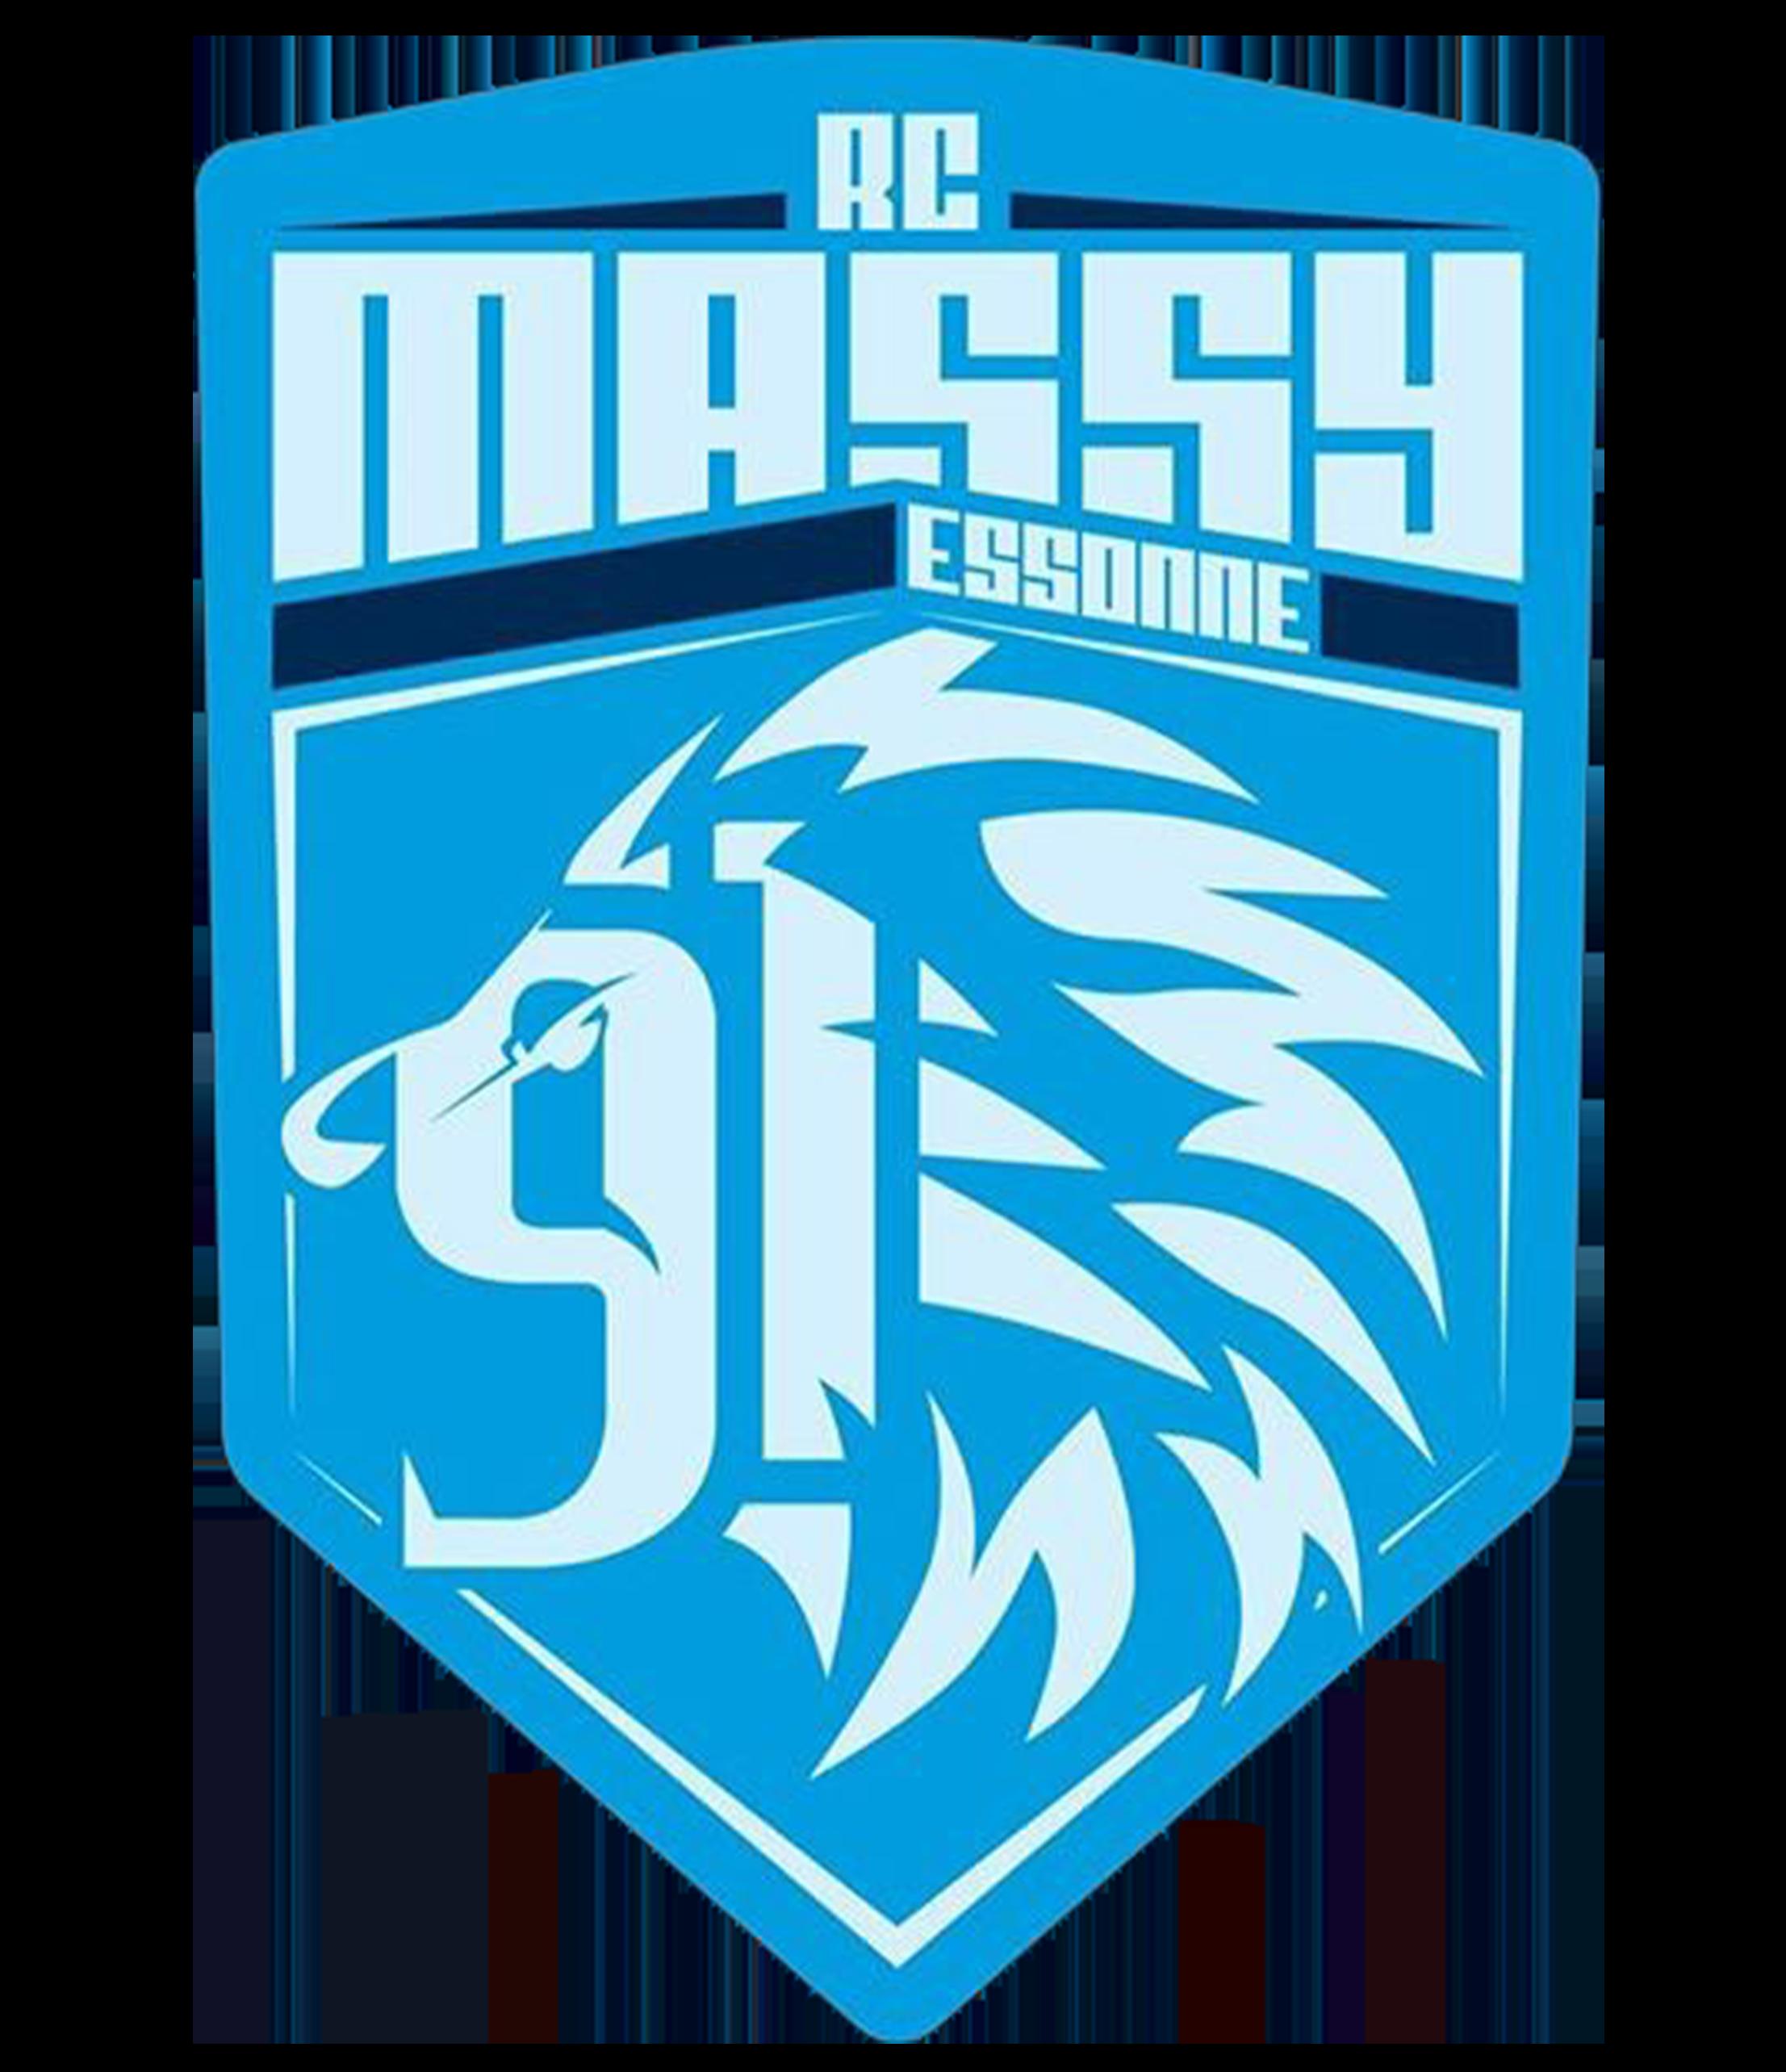 MASSY ESSONNE